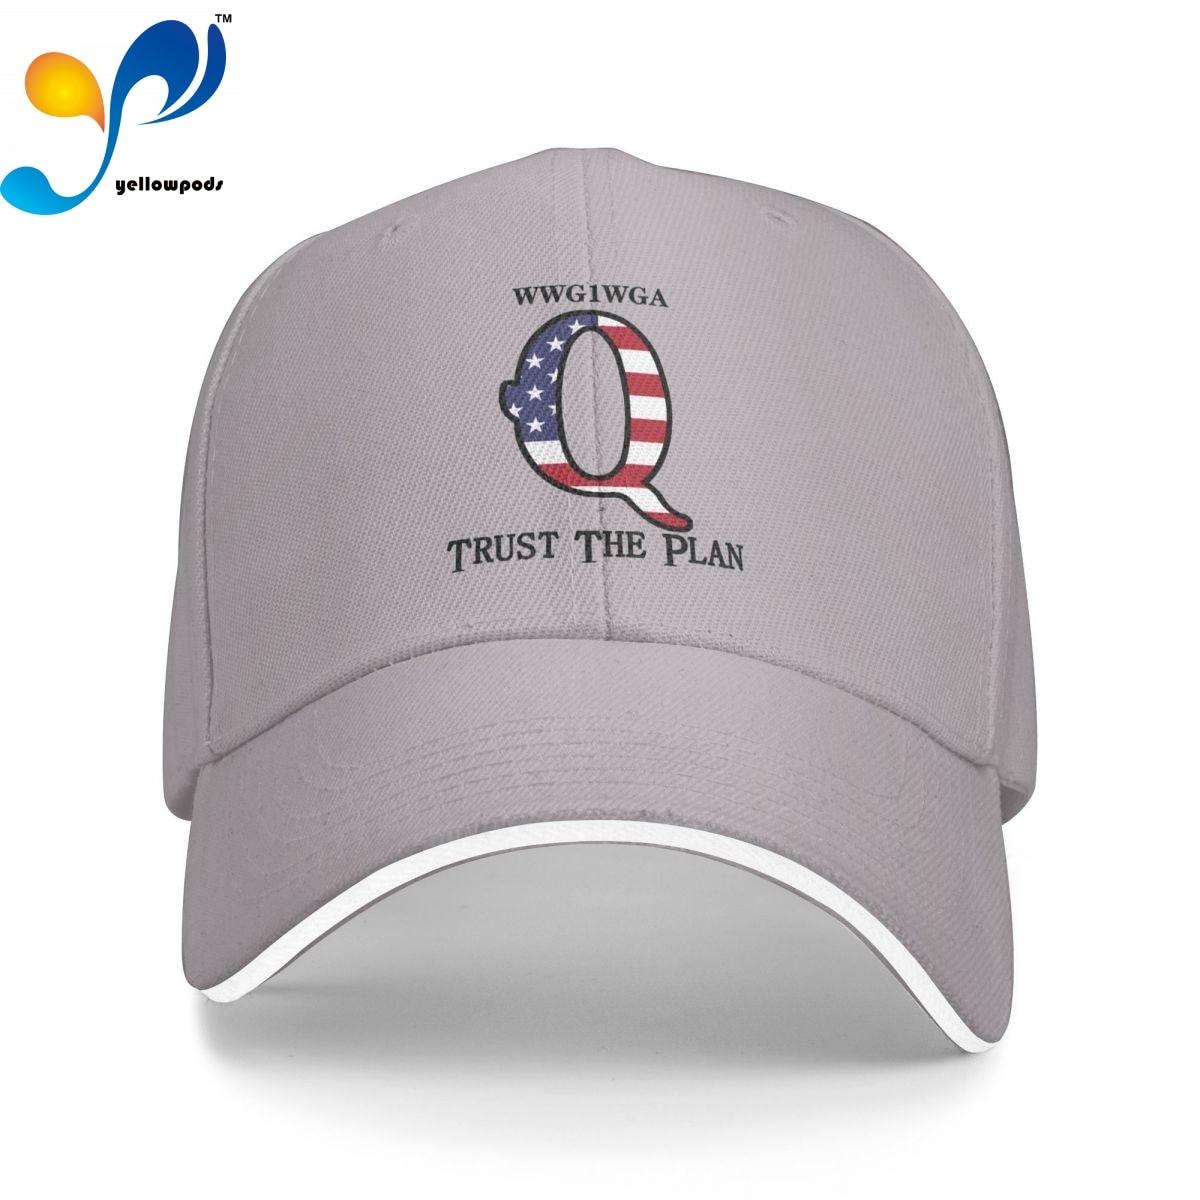 Q Patriot Trust The Plan WWG1WGA Кепка-тракер, бейсболка для мужчин, бейсболка с клапаном, мужские кепки, кепки с логотипом